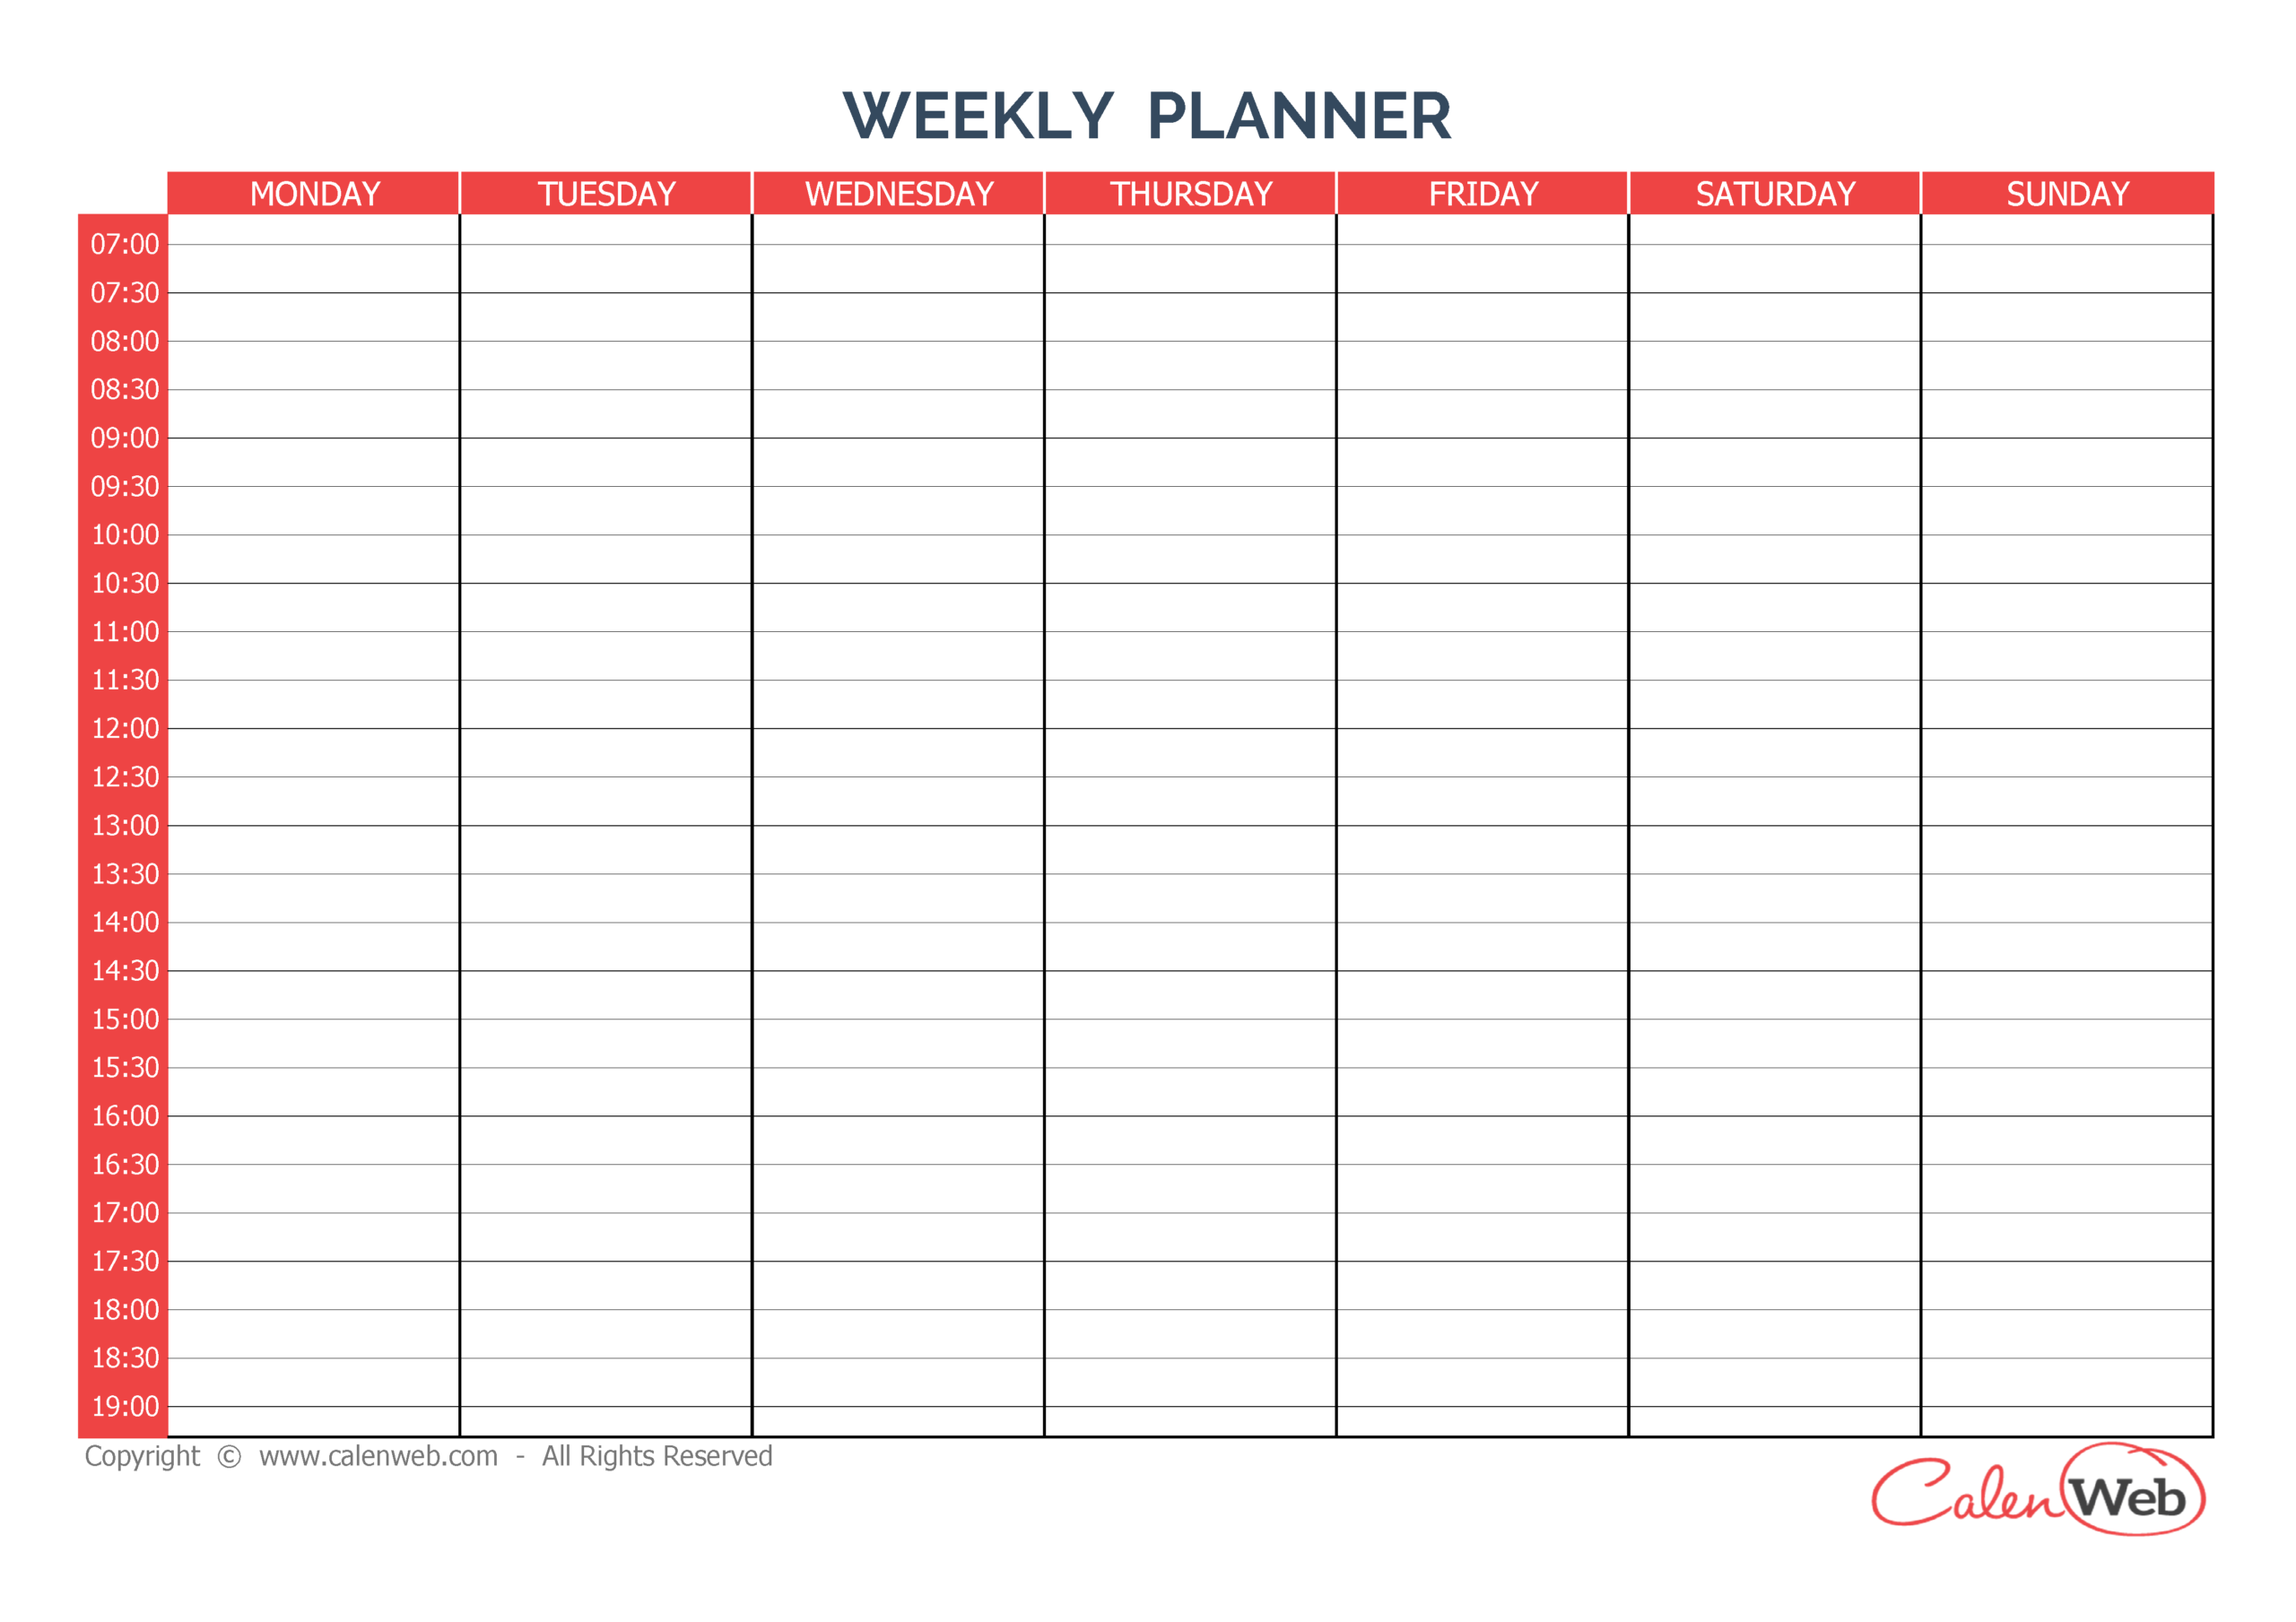 Calendriers Hebdomadaires  Calenweb regarding Saturday Through Friday Calendar